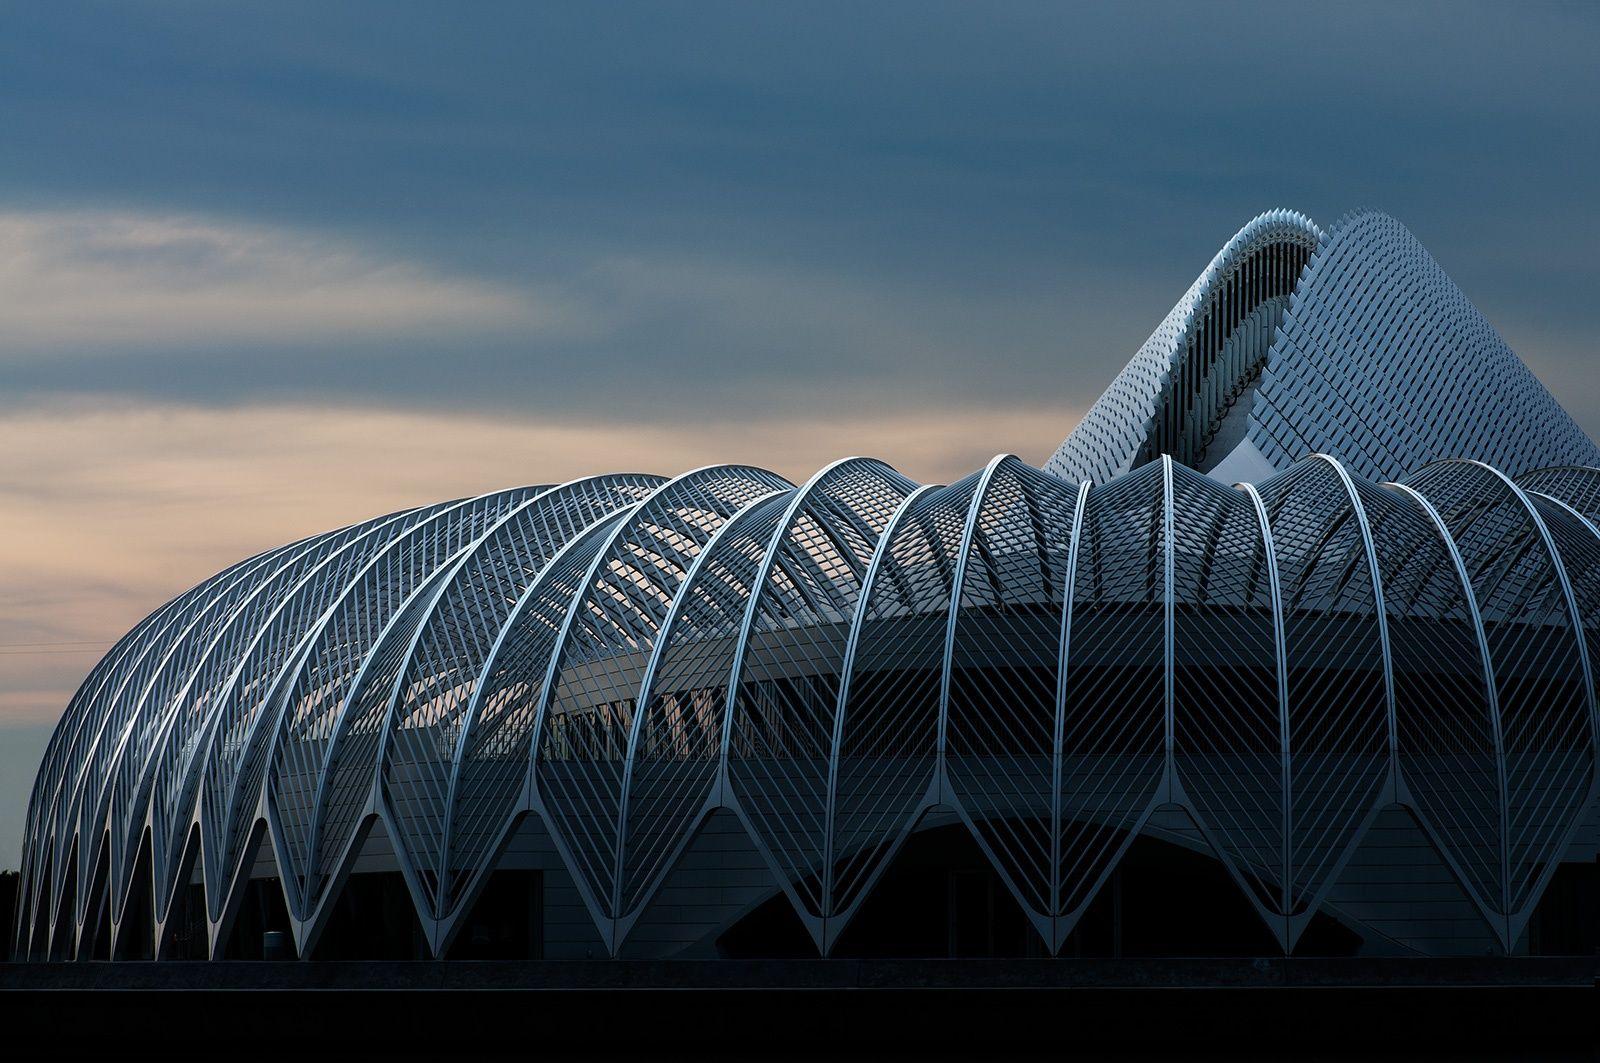 Calatrava. Innovation, Science and Technology (IST